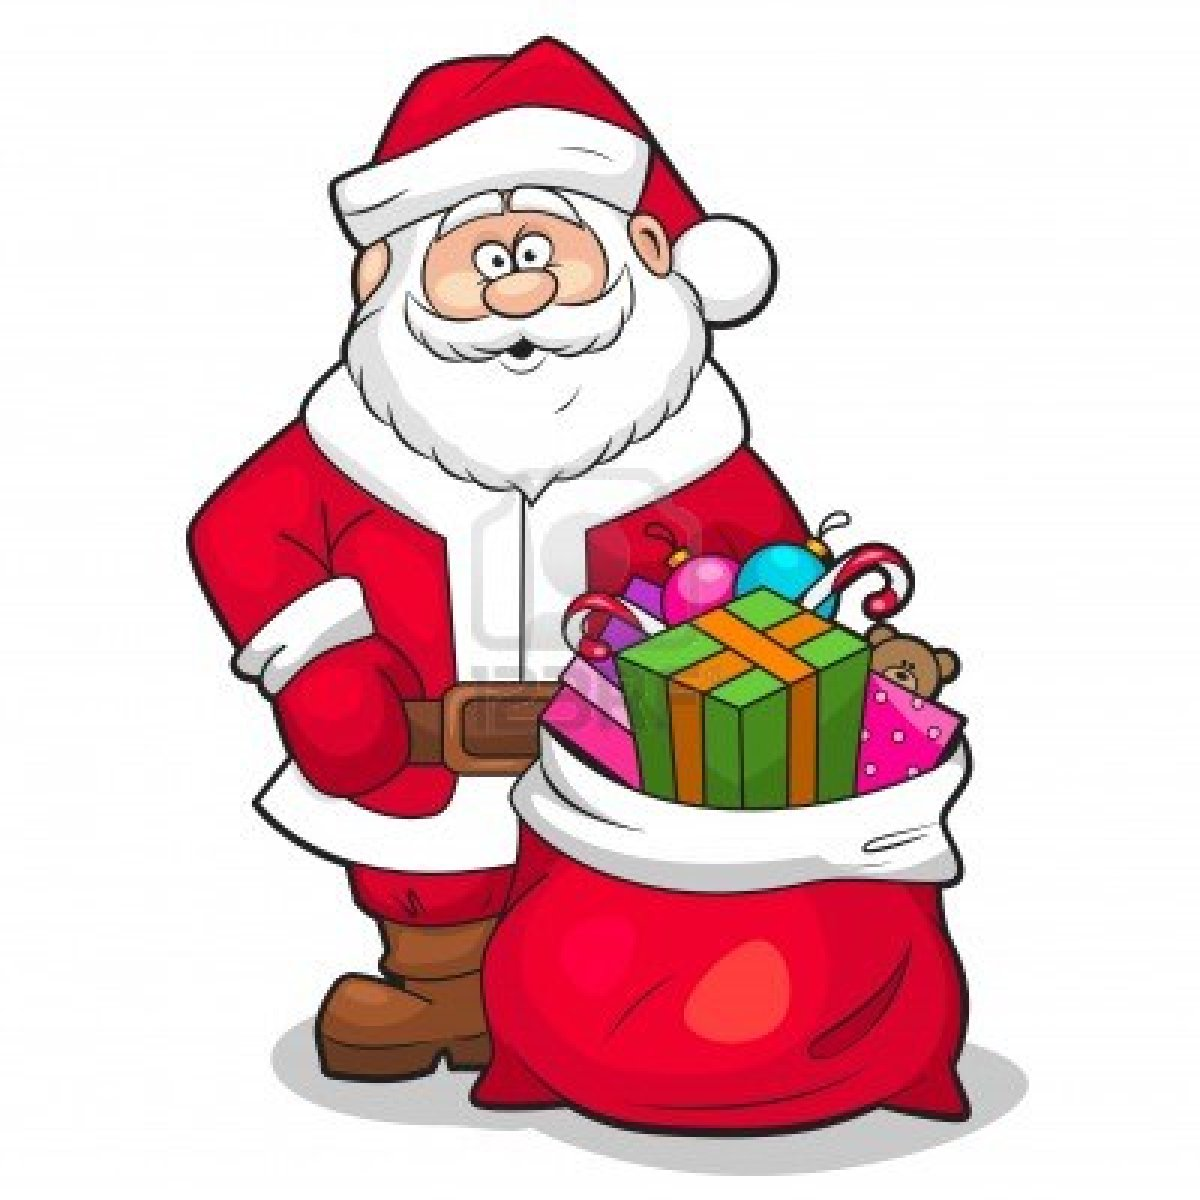 Caro Babbo Natale, vorrei un refendum…